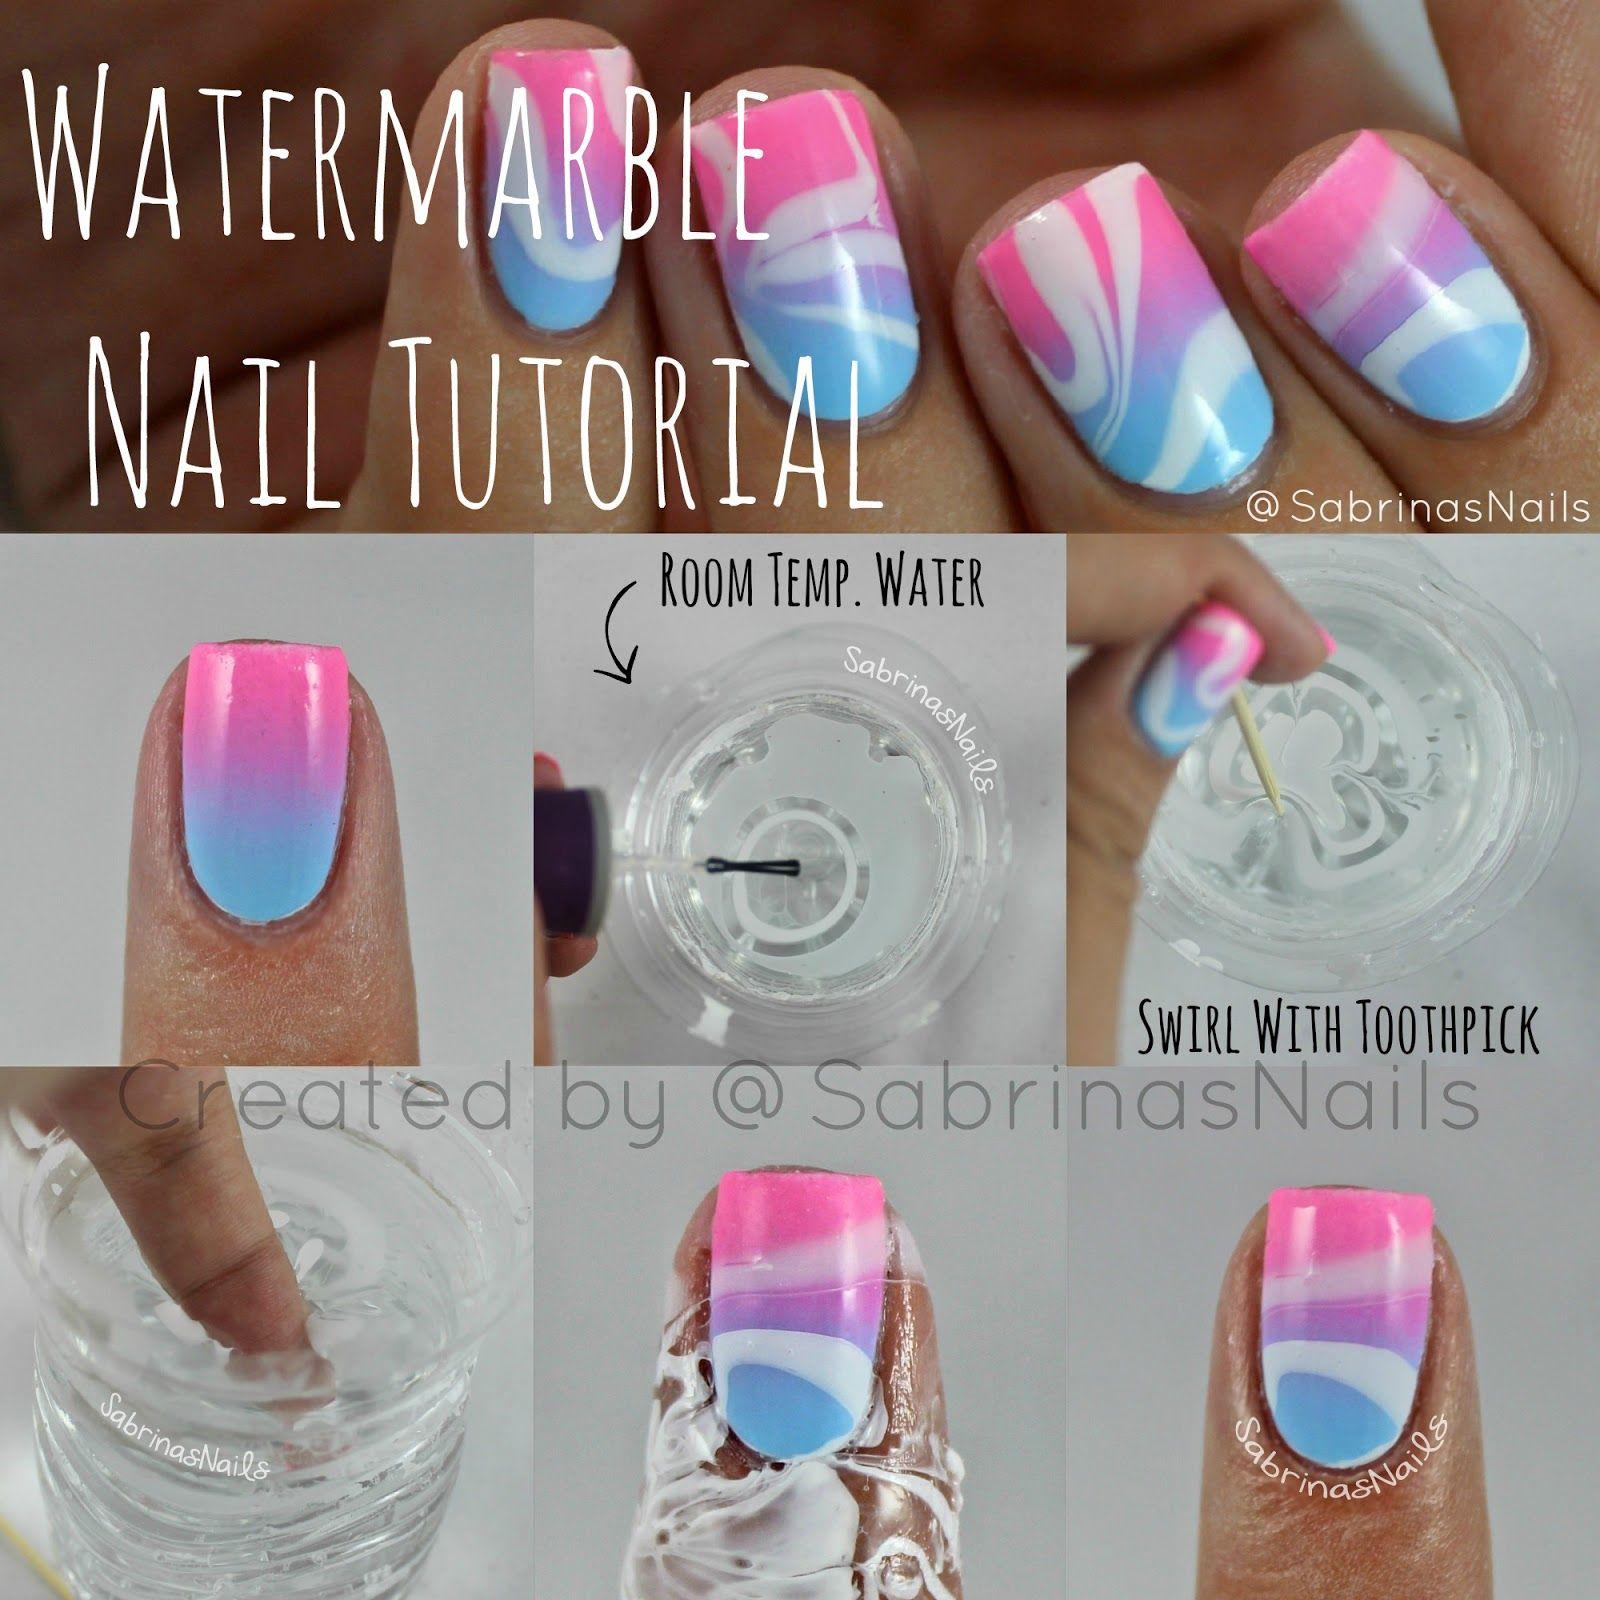 Sabrinas Nails: Watermarble Nail Tutorial | Nägel | Pinterest ...